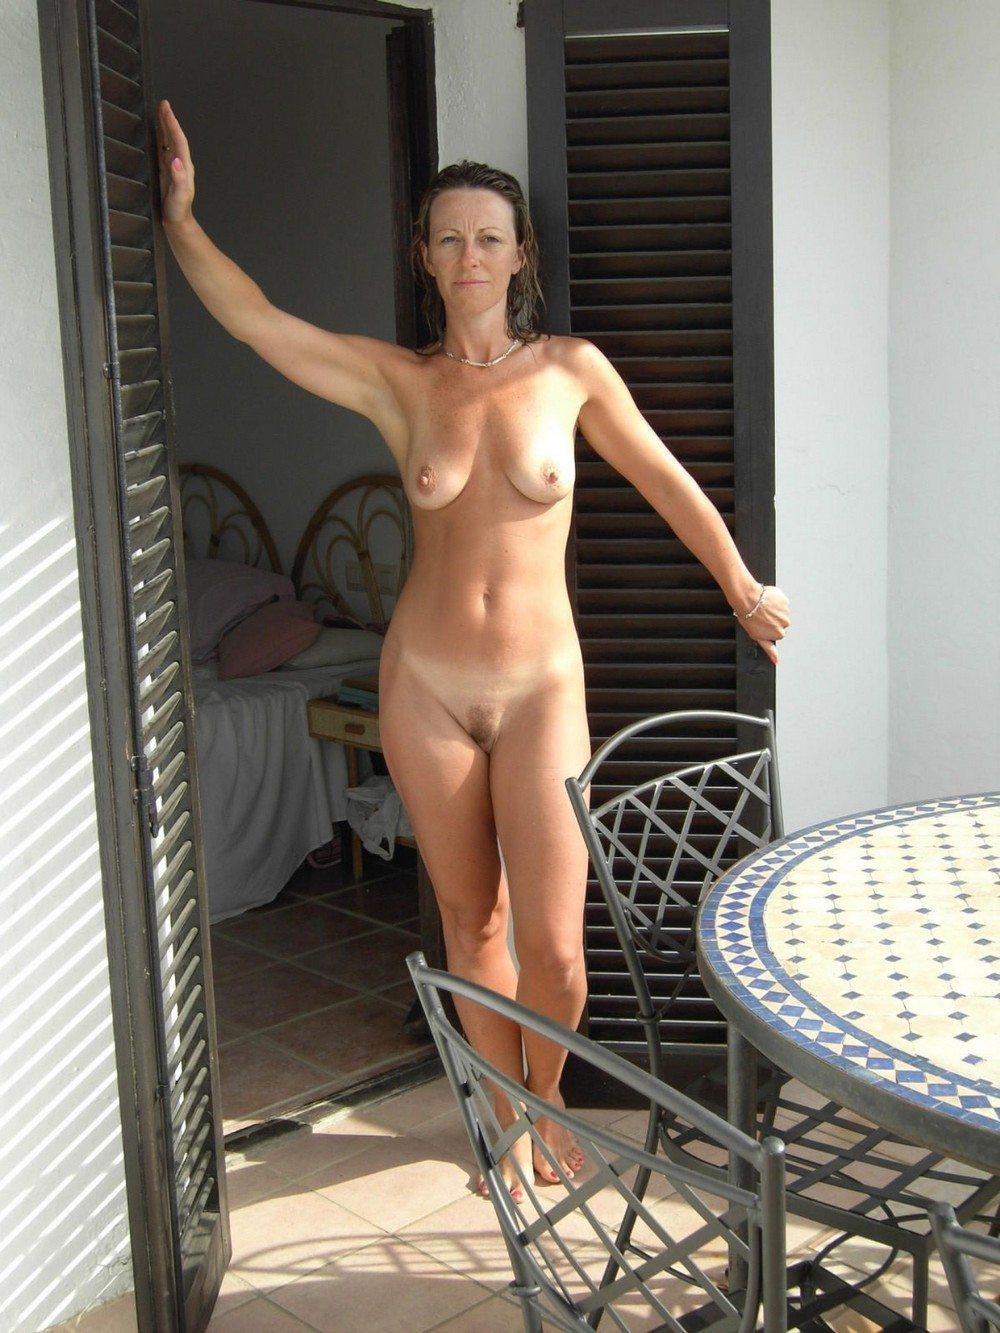 House wife nuda — pic 14